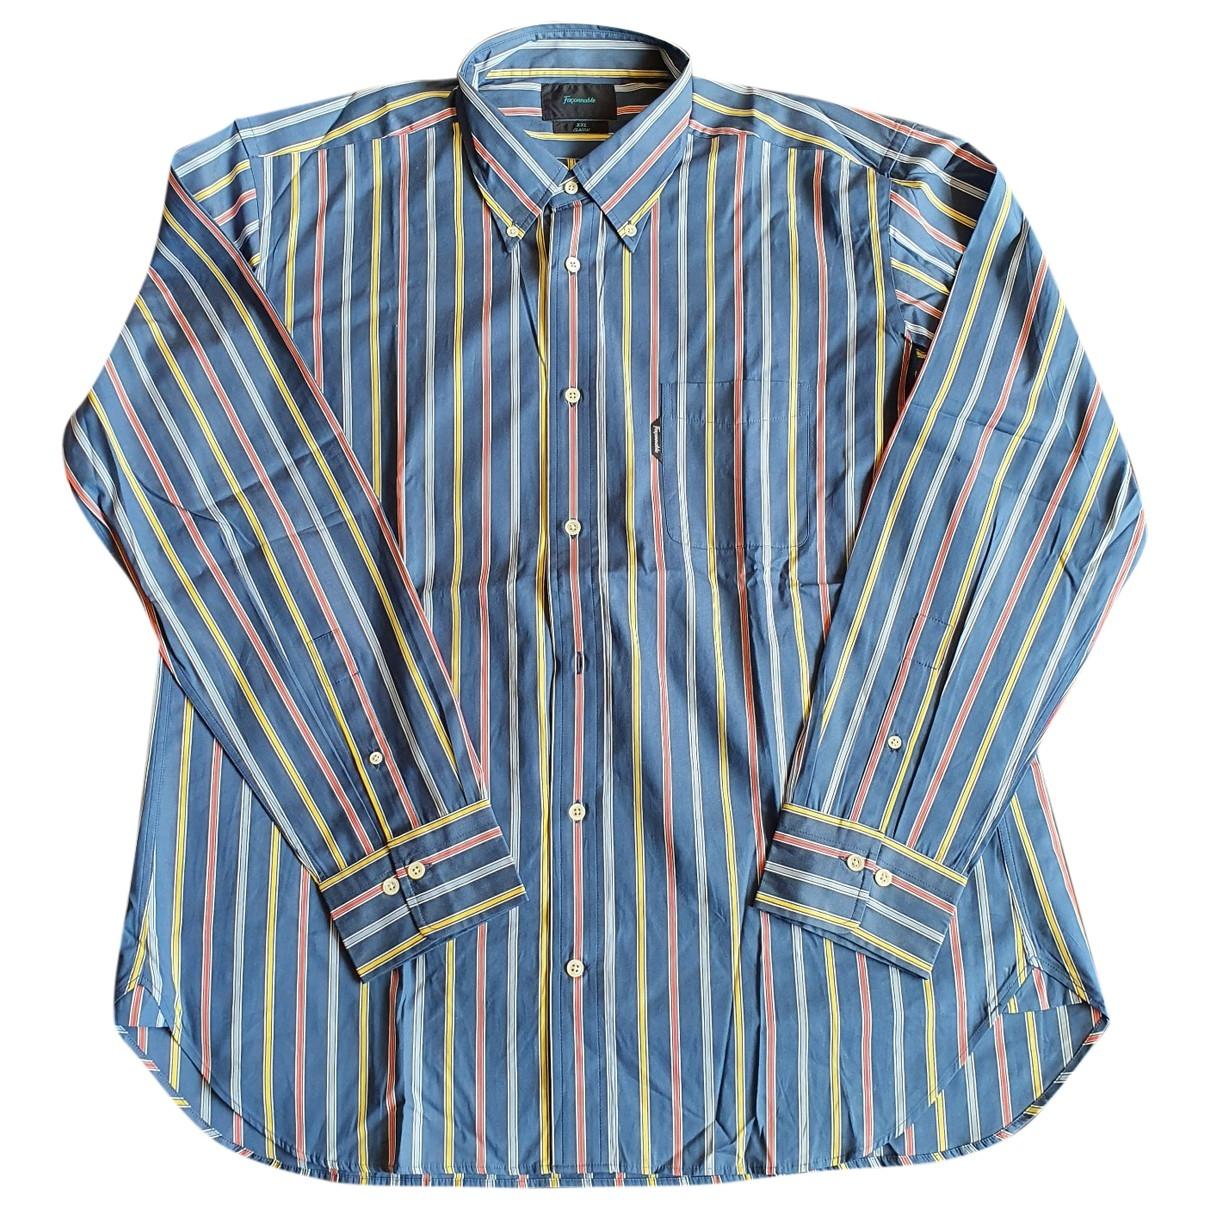 Faconnable \N Blue Cotton Shirts for Men XXL International